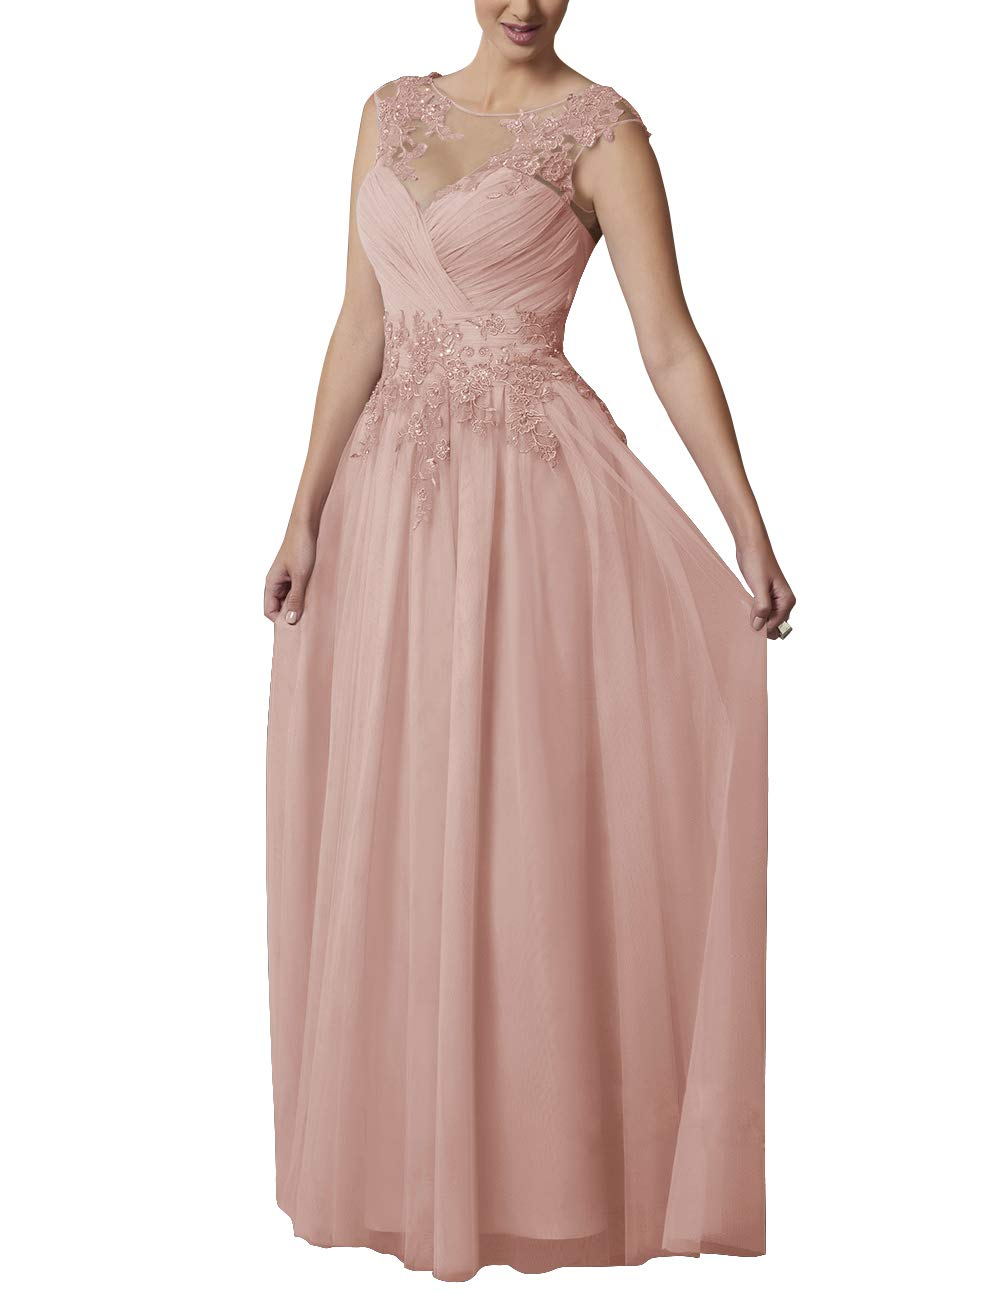 Mermaid Petticoat Slip Crinoline Spandex Elastic Waist Brand New S M L